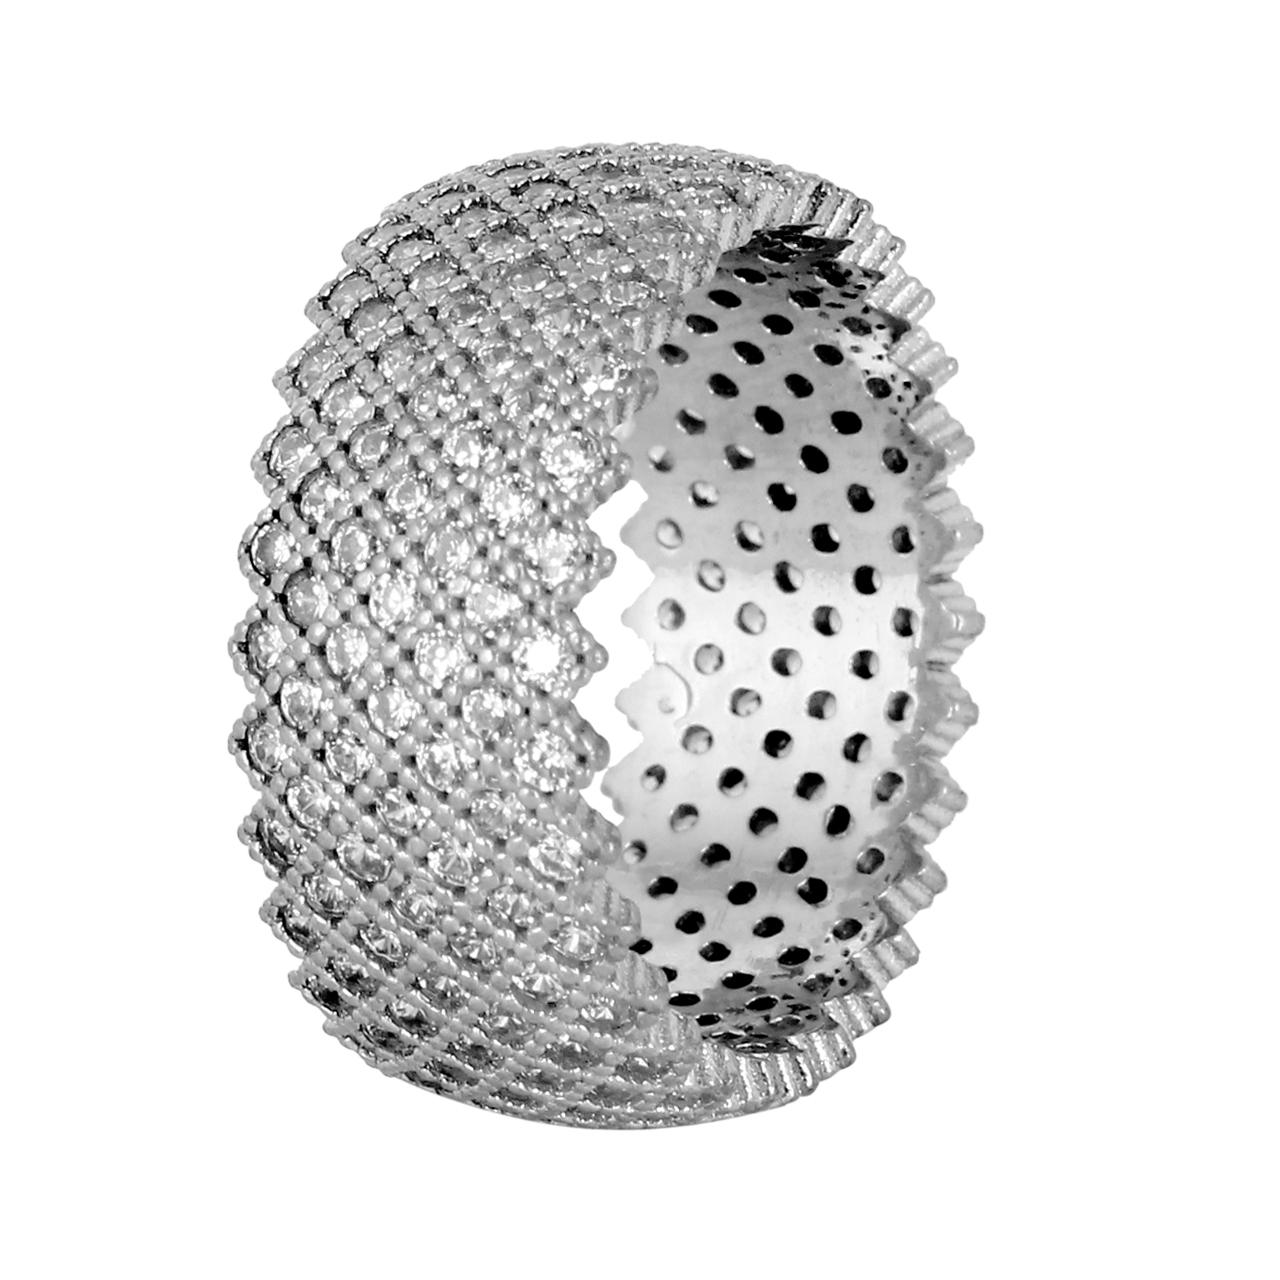 انگشتر نقره مدوکلاس کد 180174